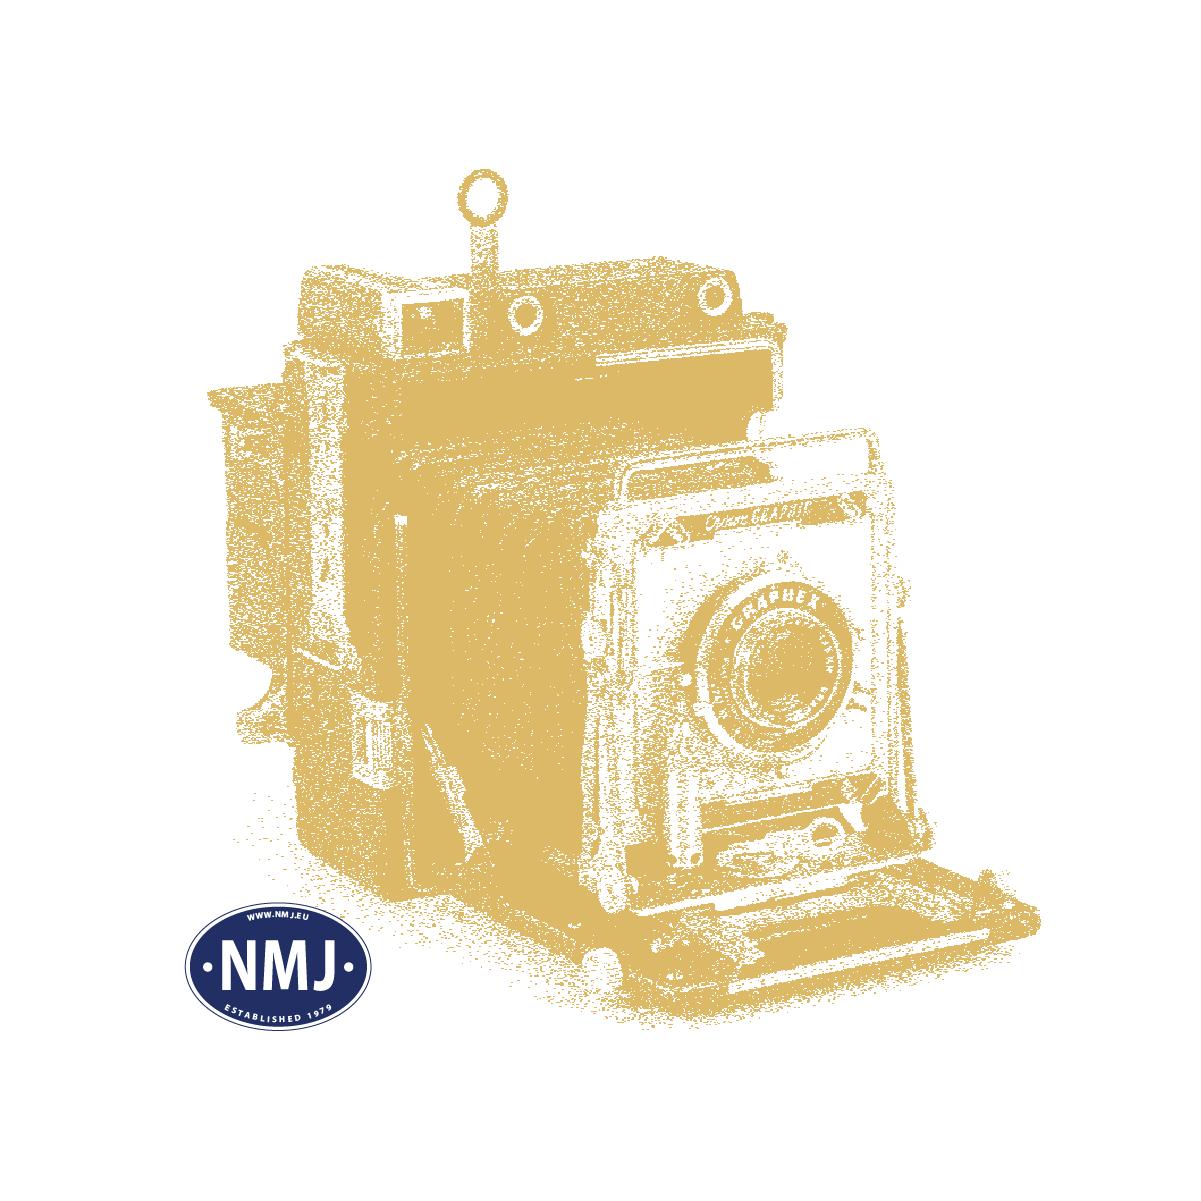 NMJT84.103L - NMJ Topline NSB BM69A.014, DCC m/ Sound und Innenbeleuchtung